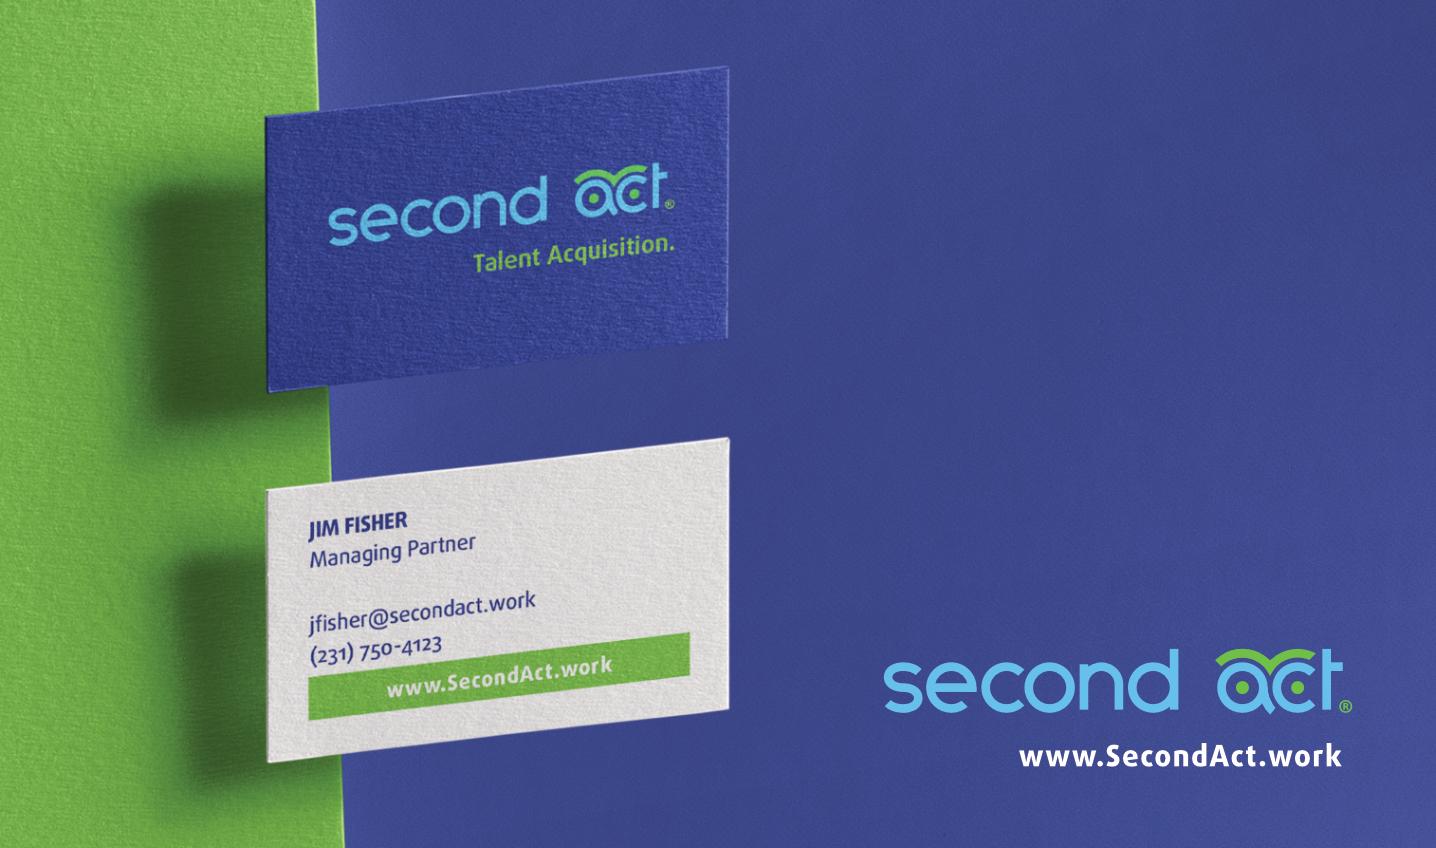 Second Act branding